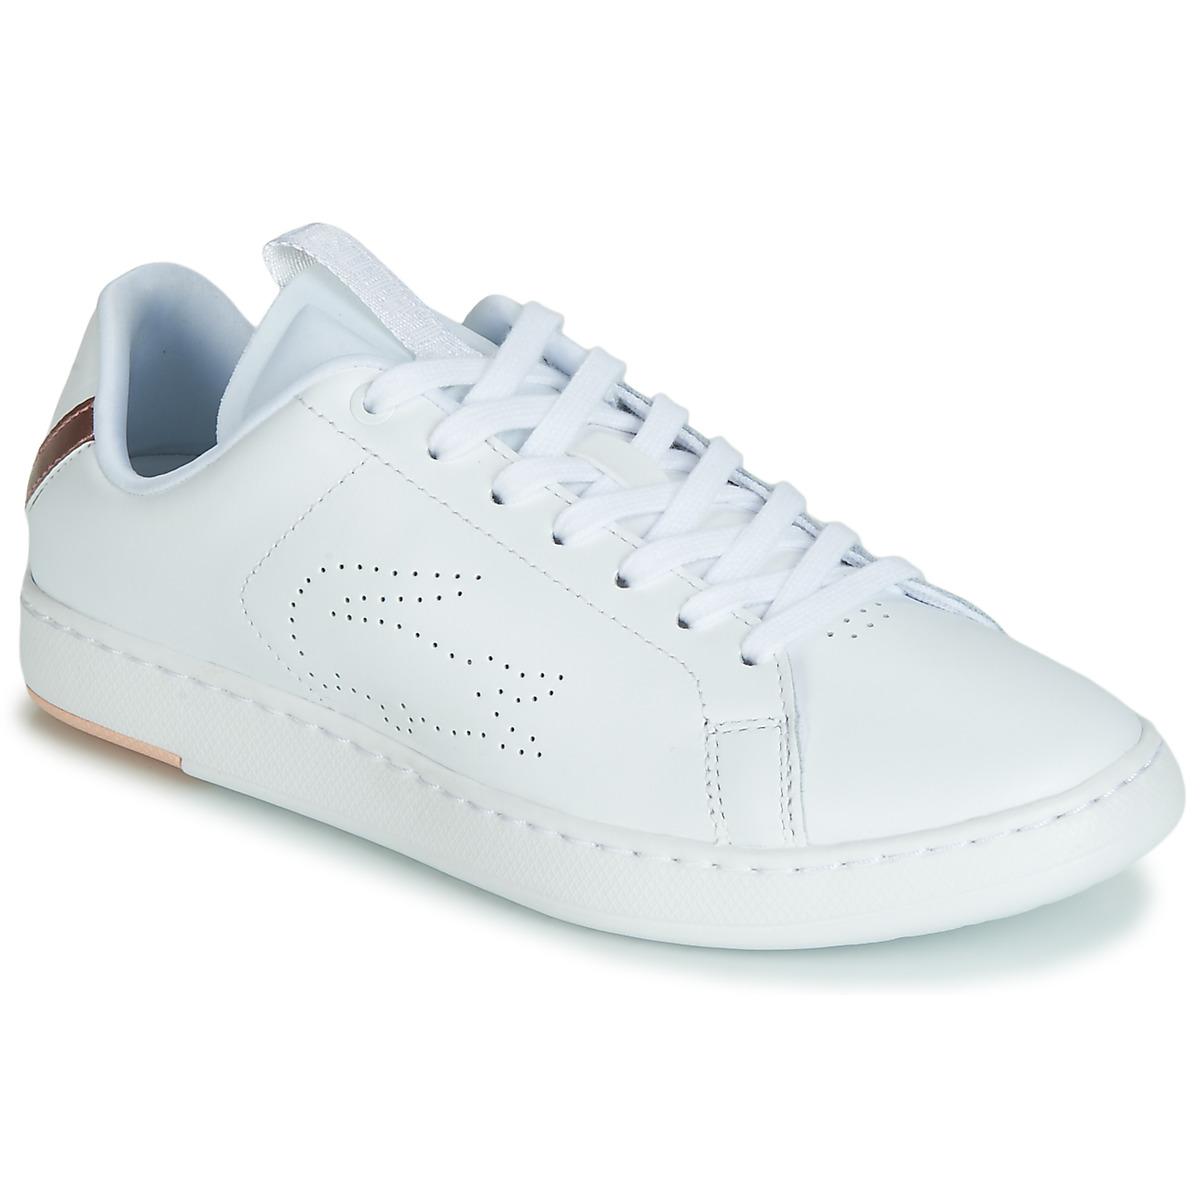 Sneakers Lacoste  CARNABY EVO LIGHT-WT 119 3